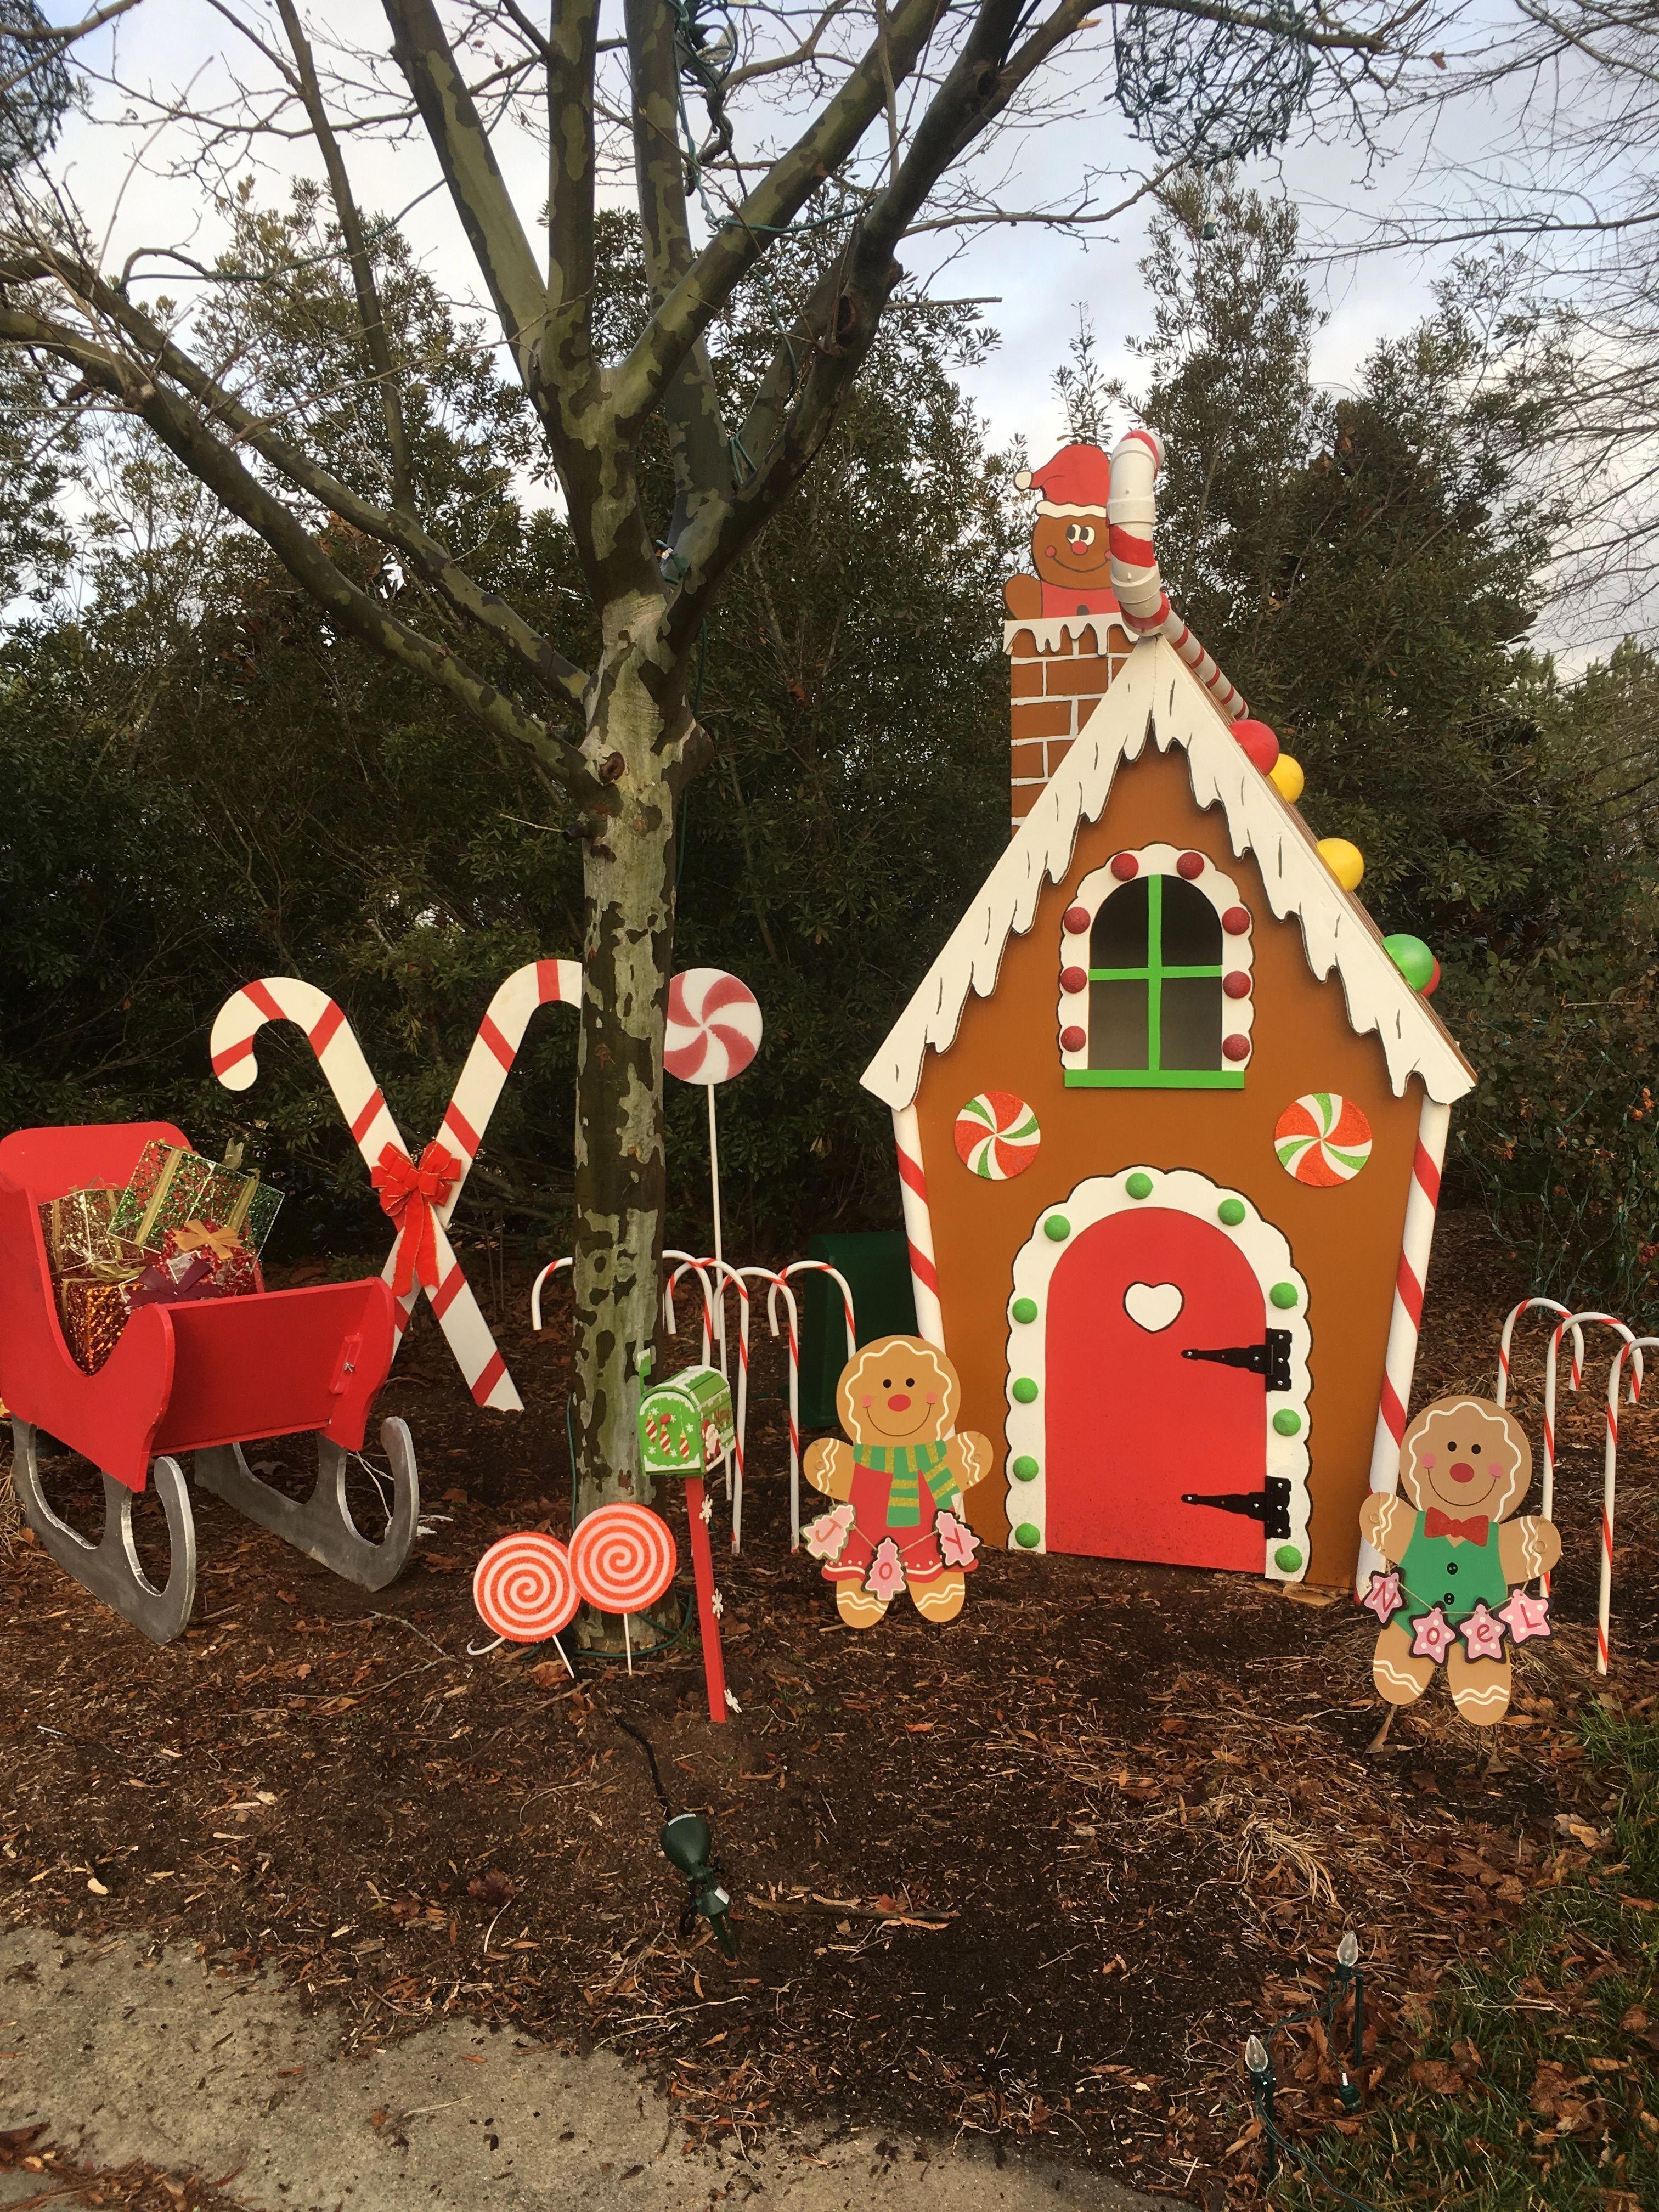 Wooden Gingerbread House Life Sized Christmaslightsindoordecor Christmas Yard Decorations Outside Christmas Decorations Christmas Decorations Diy Outdoor